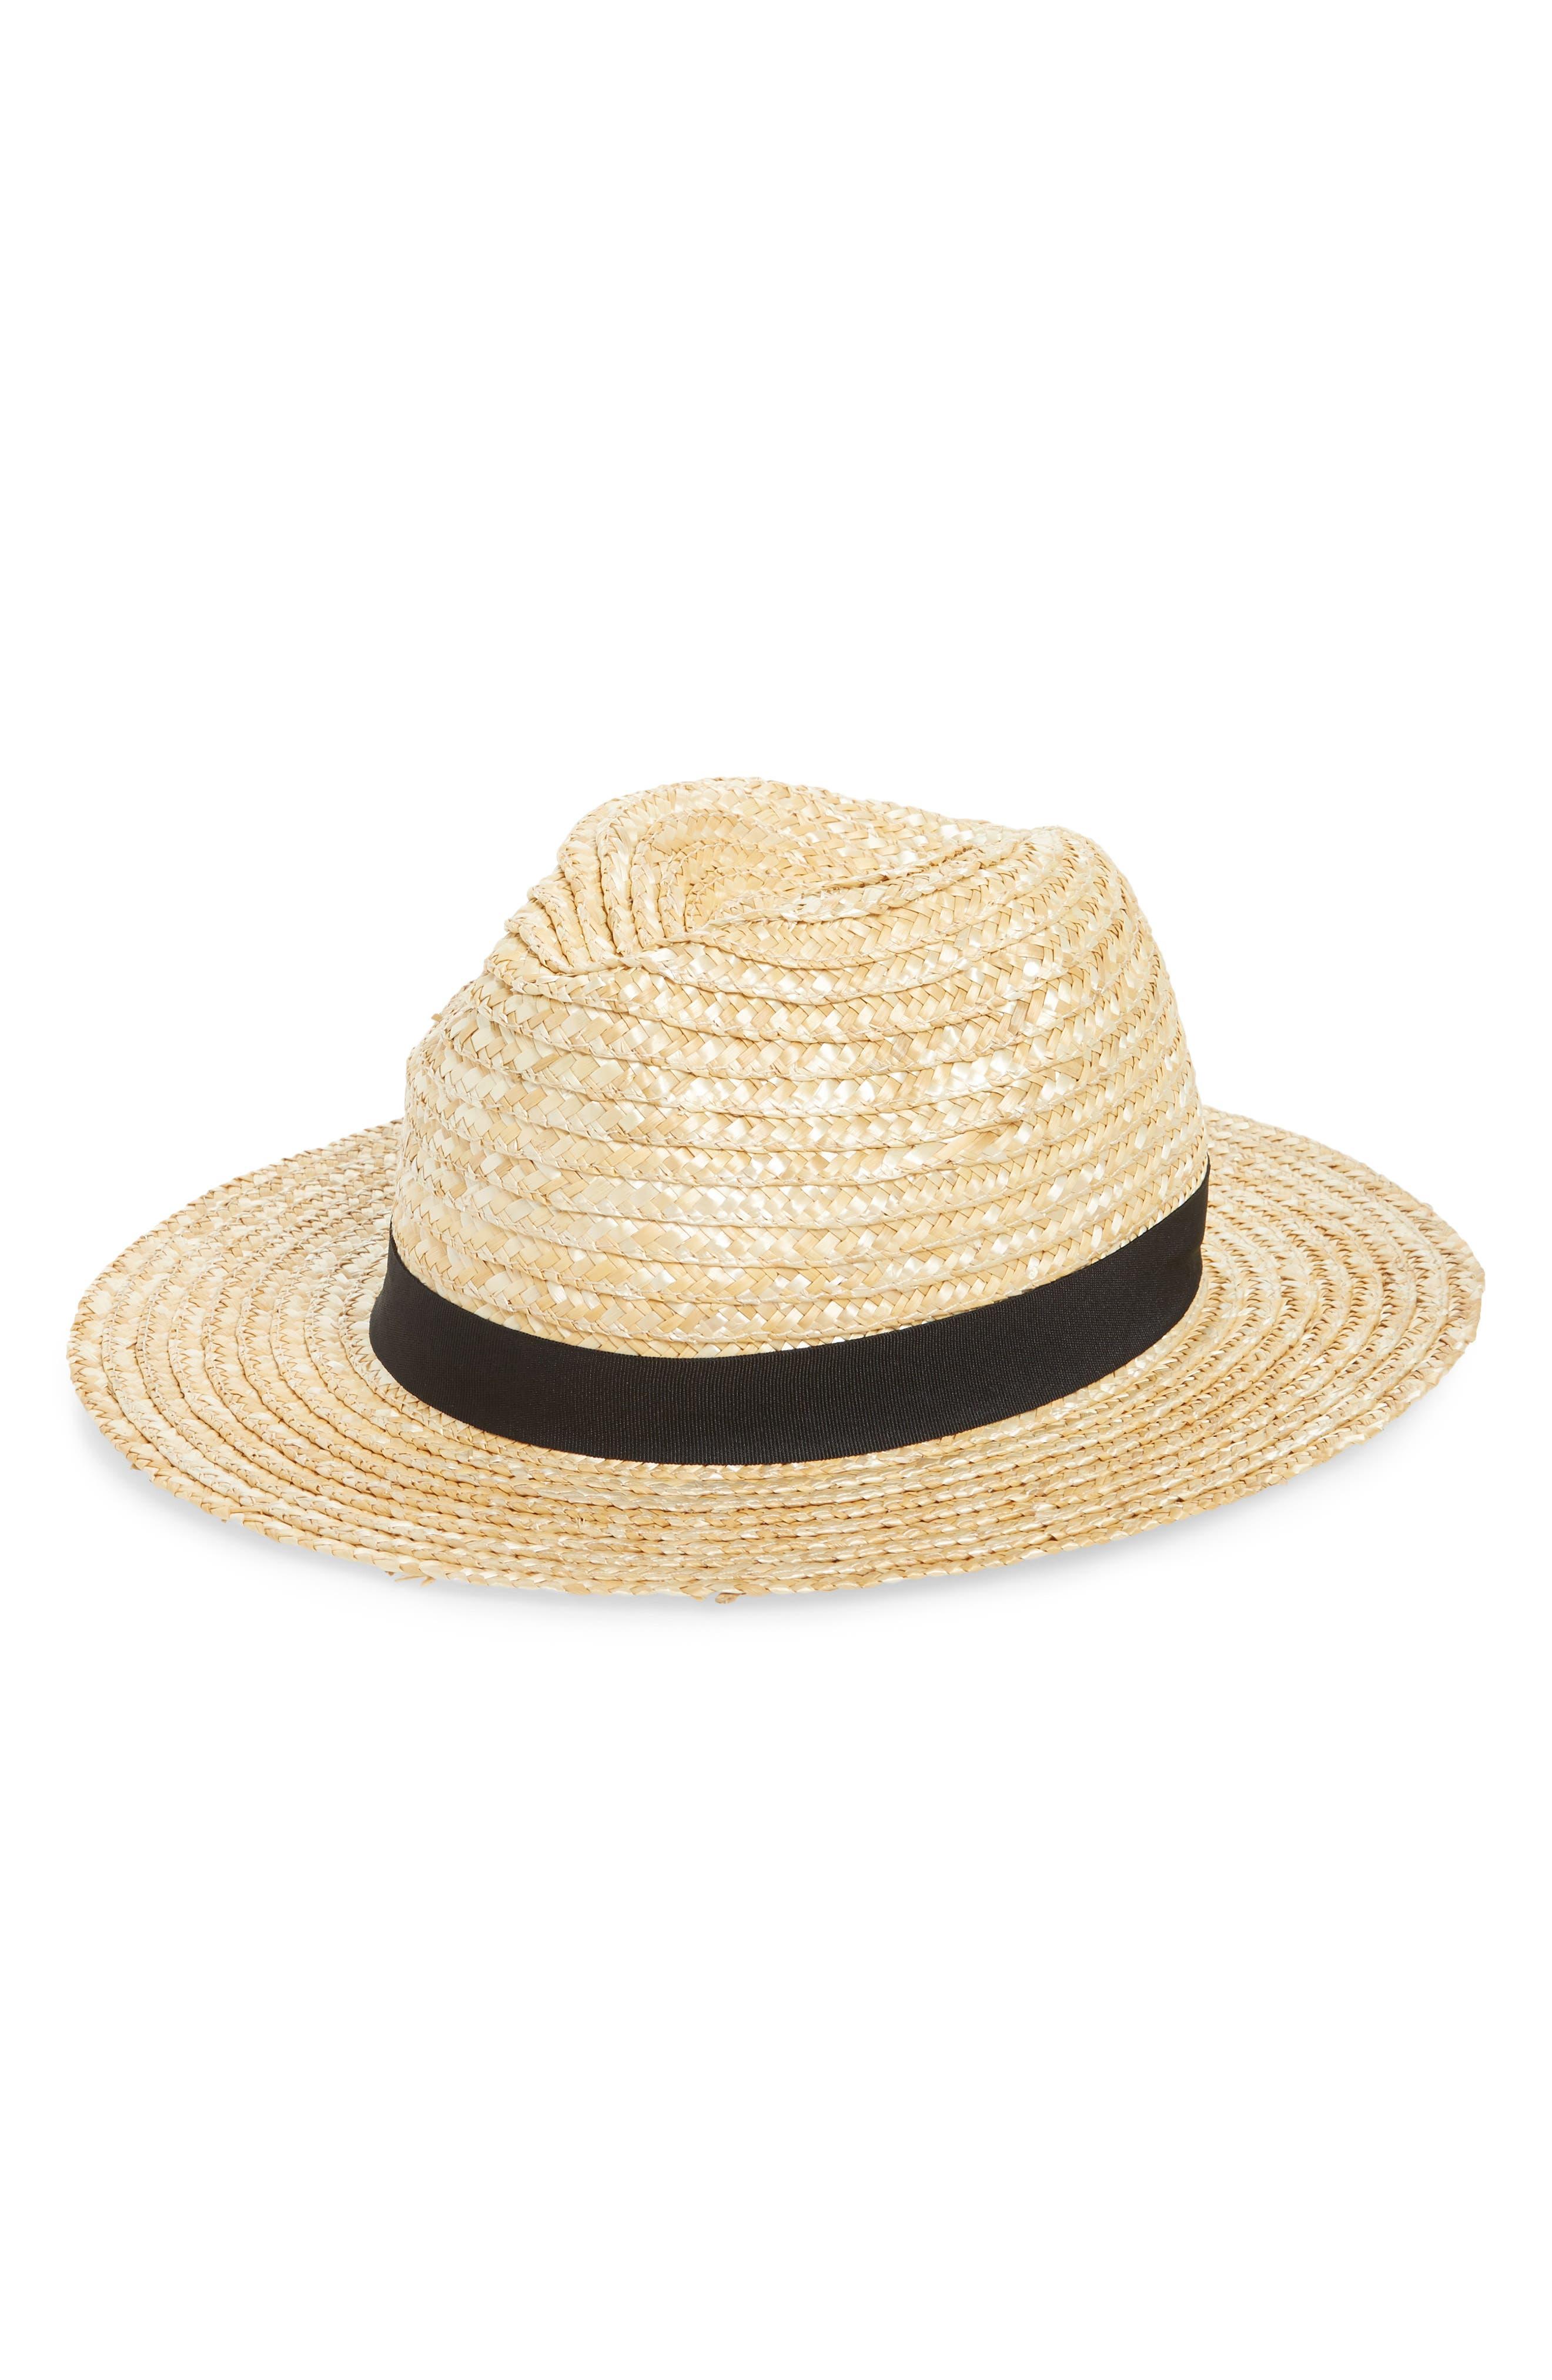 BP. Braided Panama Hat